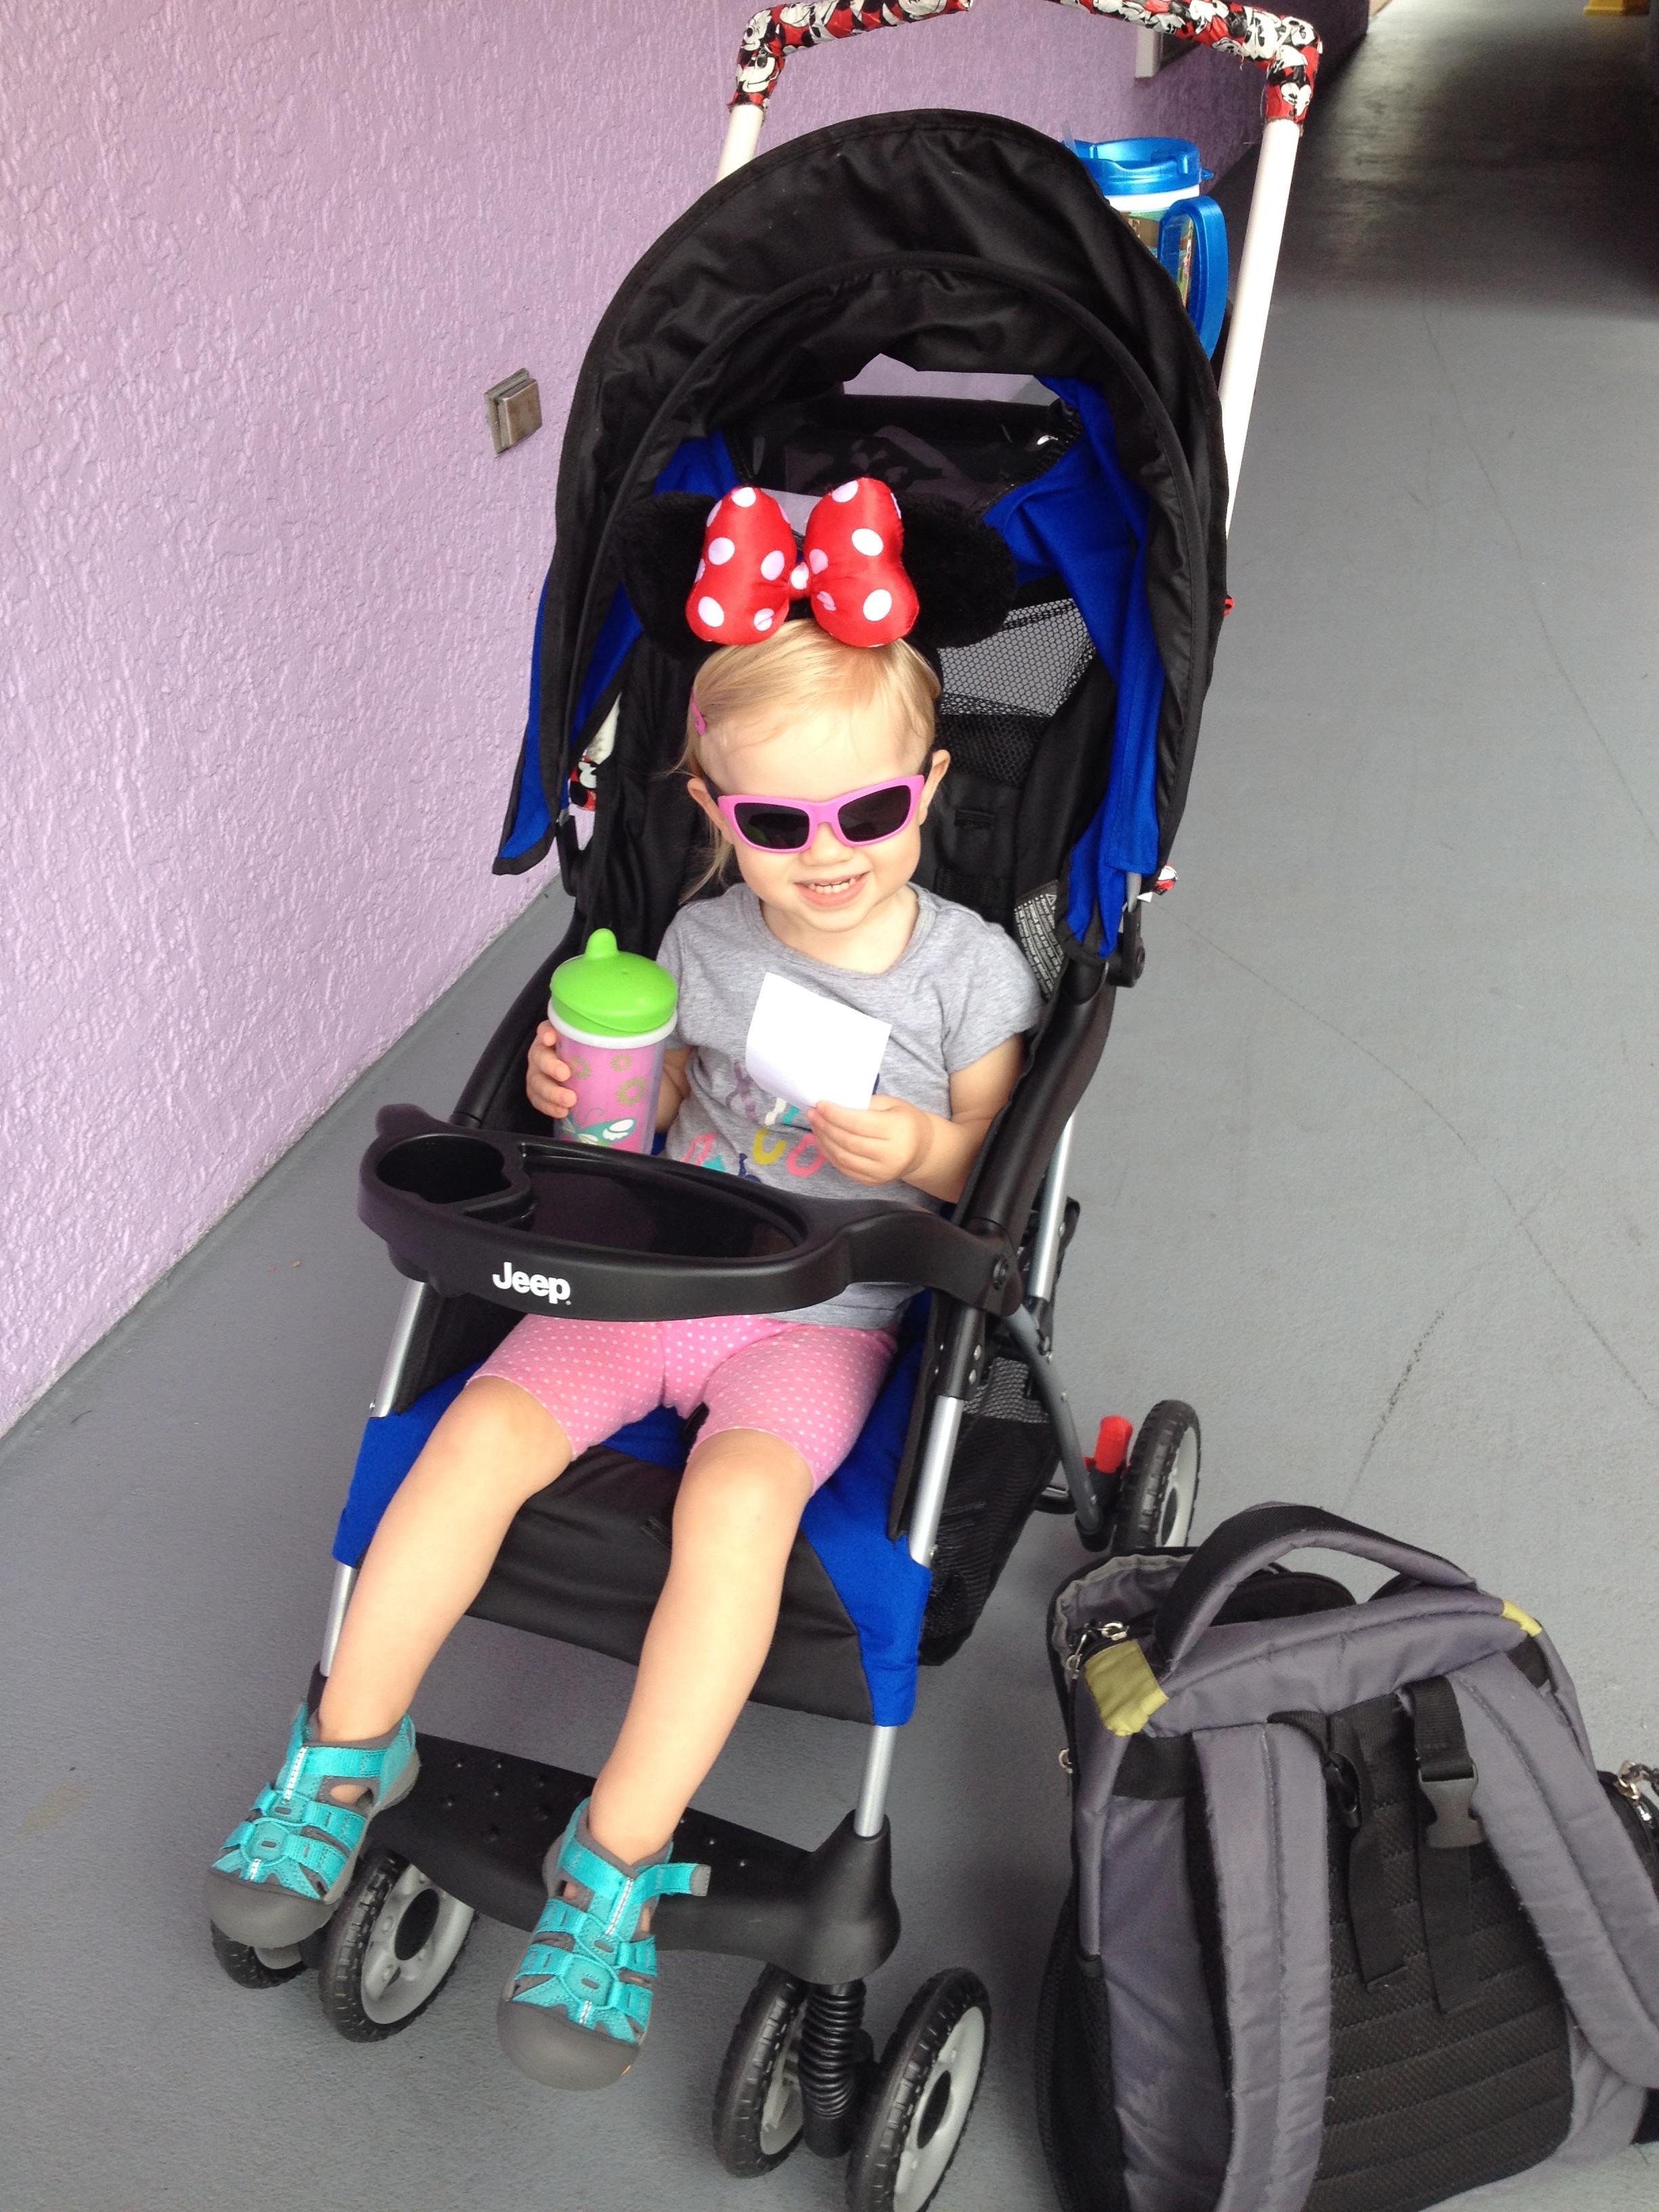 little girl in a stroller